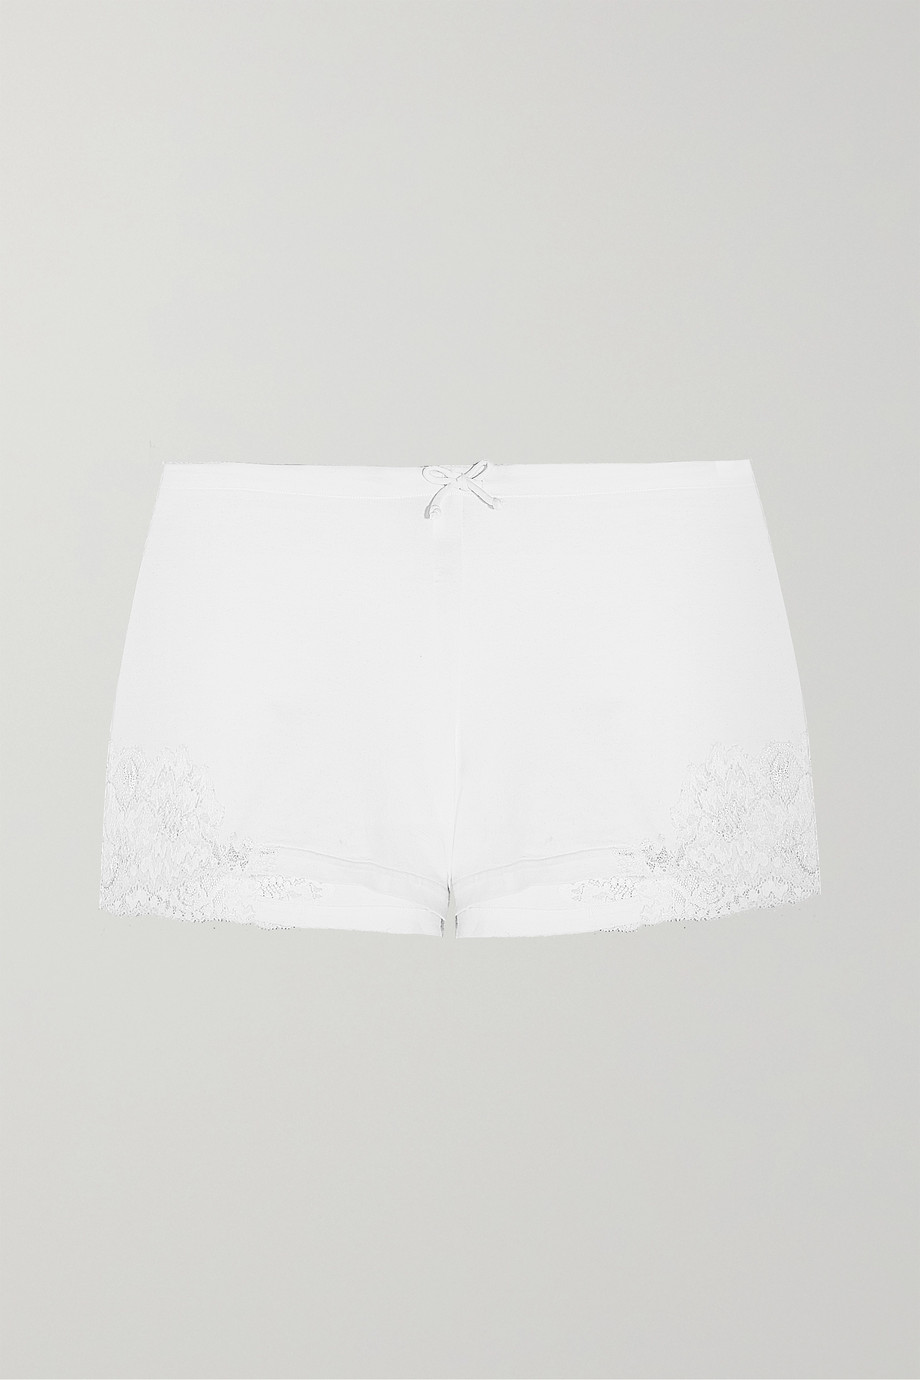 La Perla Souple 蕾丝边饰弹力棉质平纹针织短睡裤